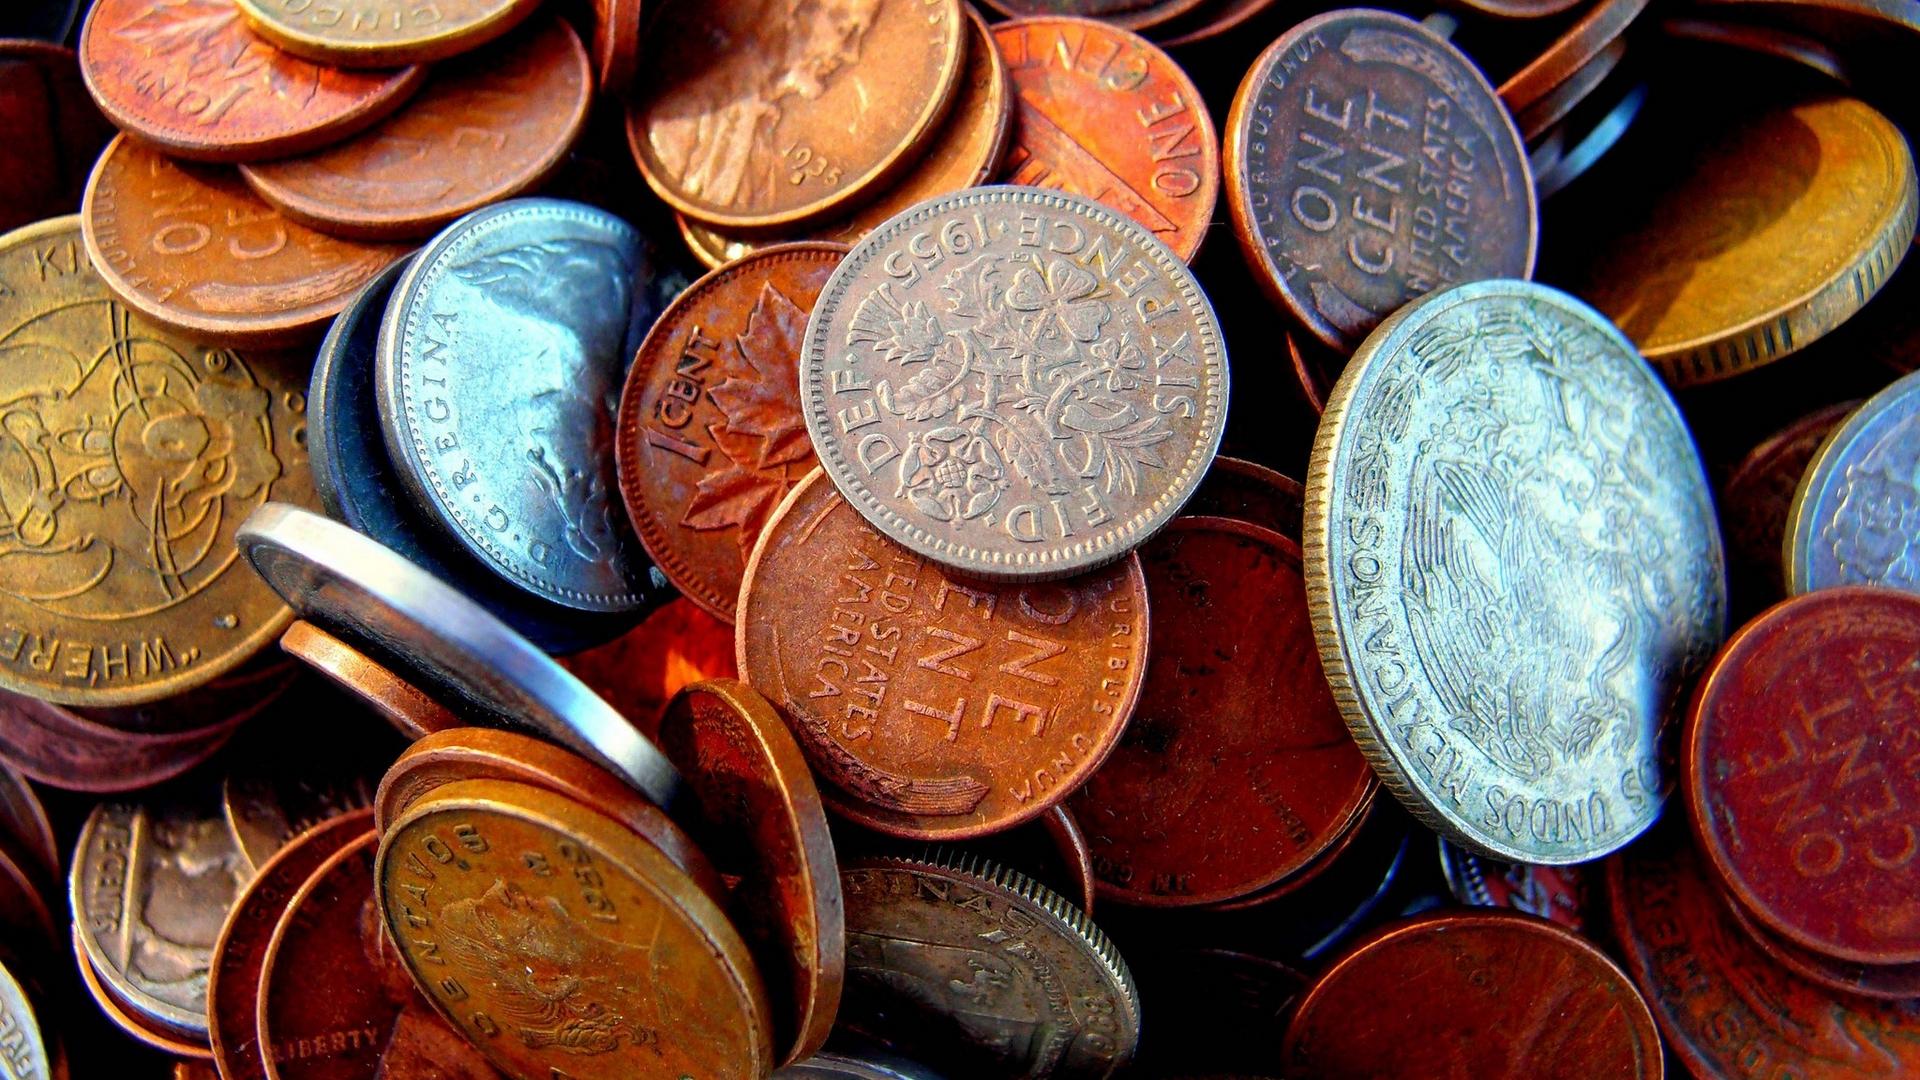 обои копейки, монеты, металл, чеканка картинки фото